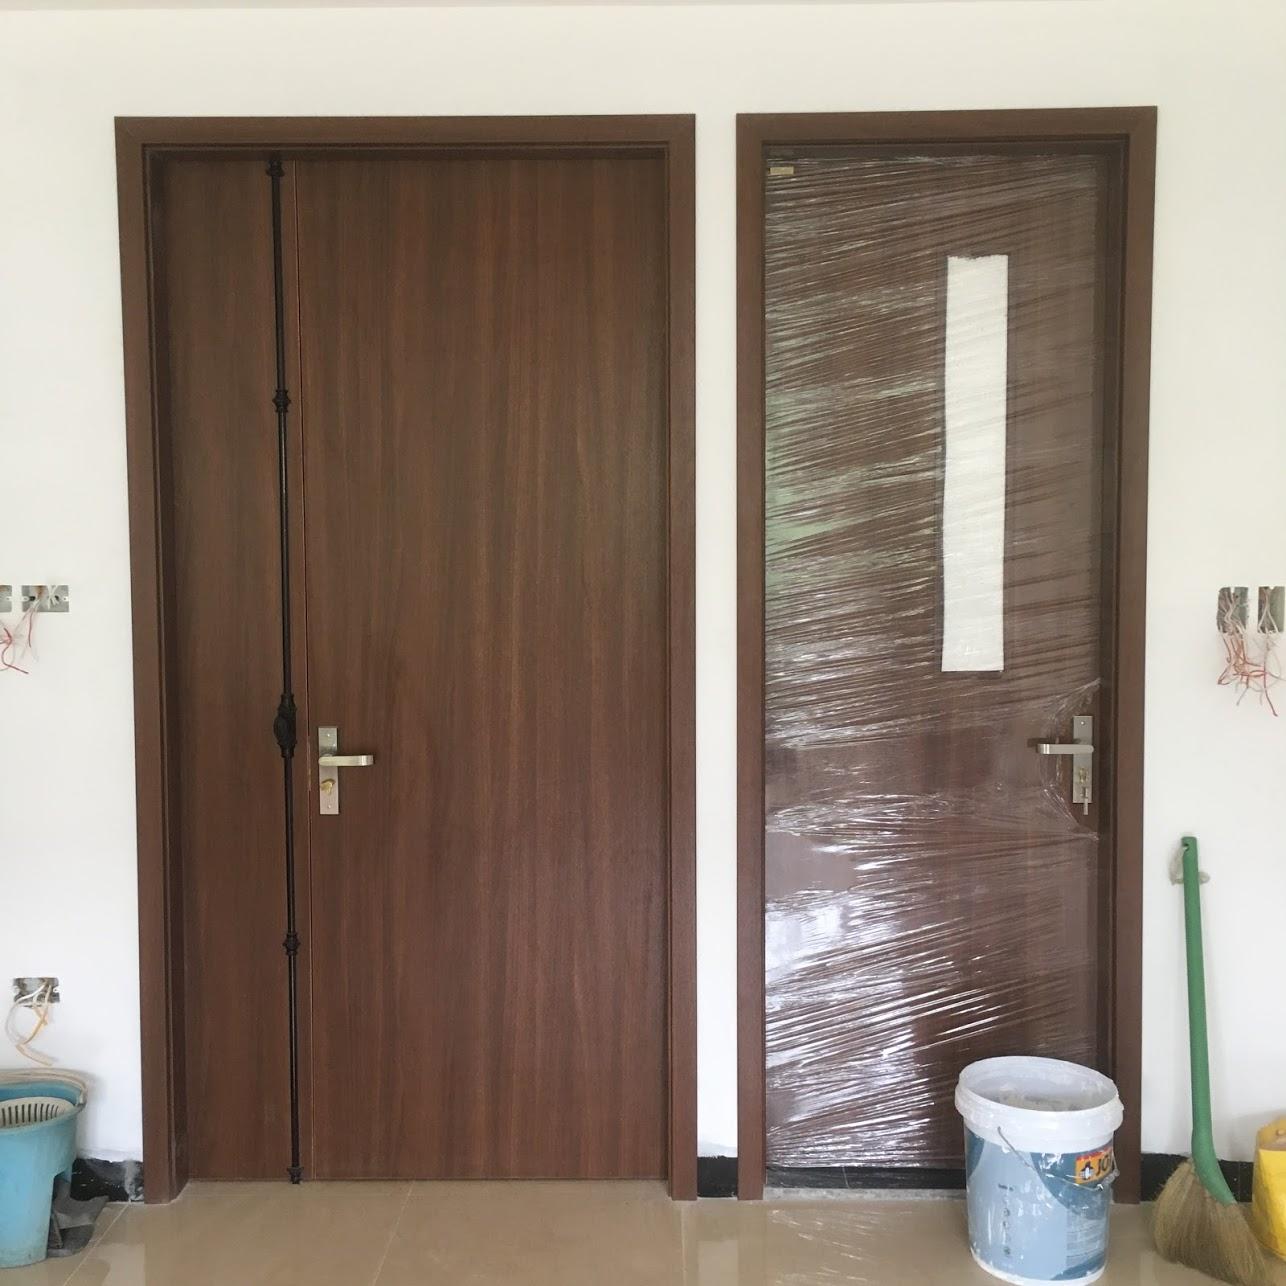 Lắp đặt cửa gỗ Huge tại eco park